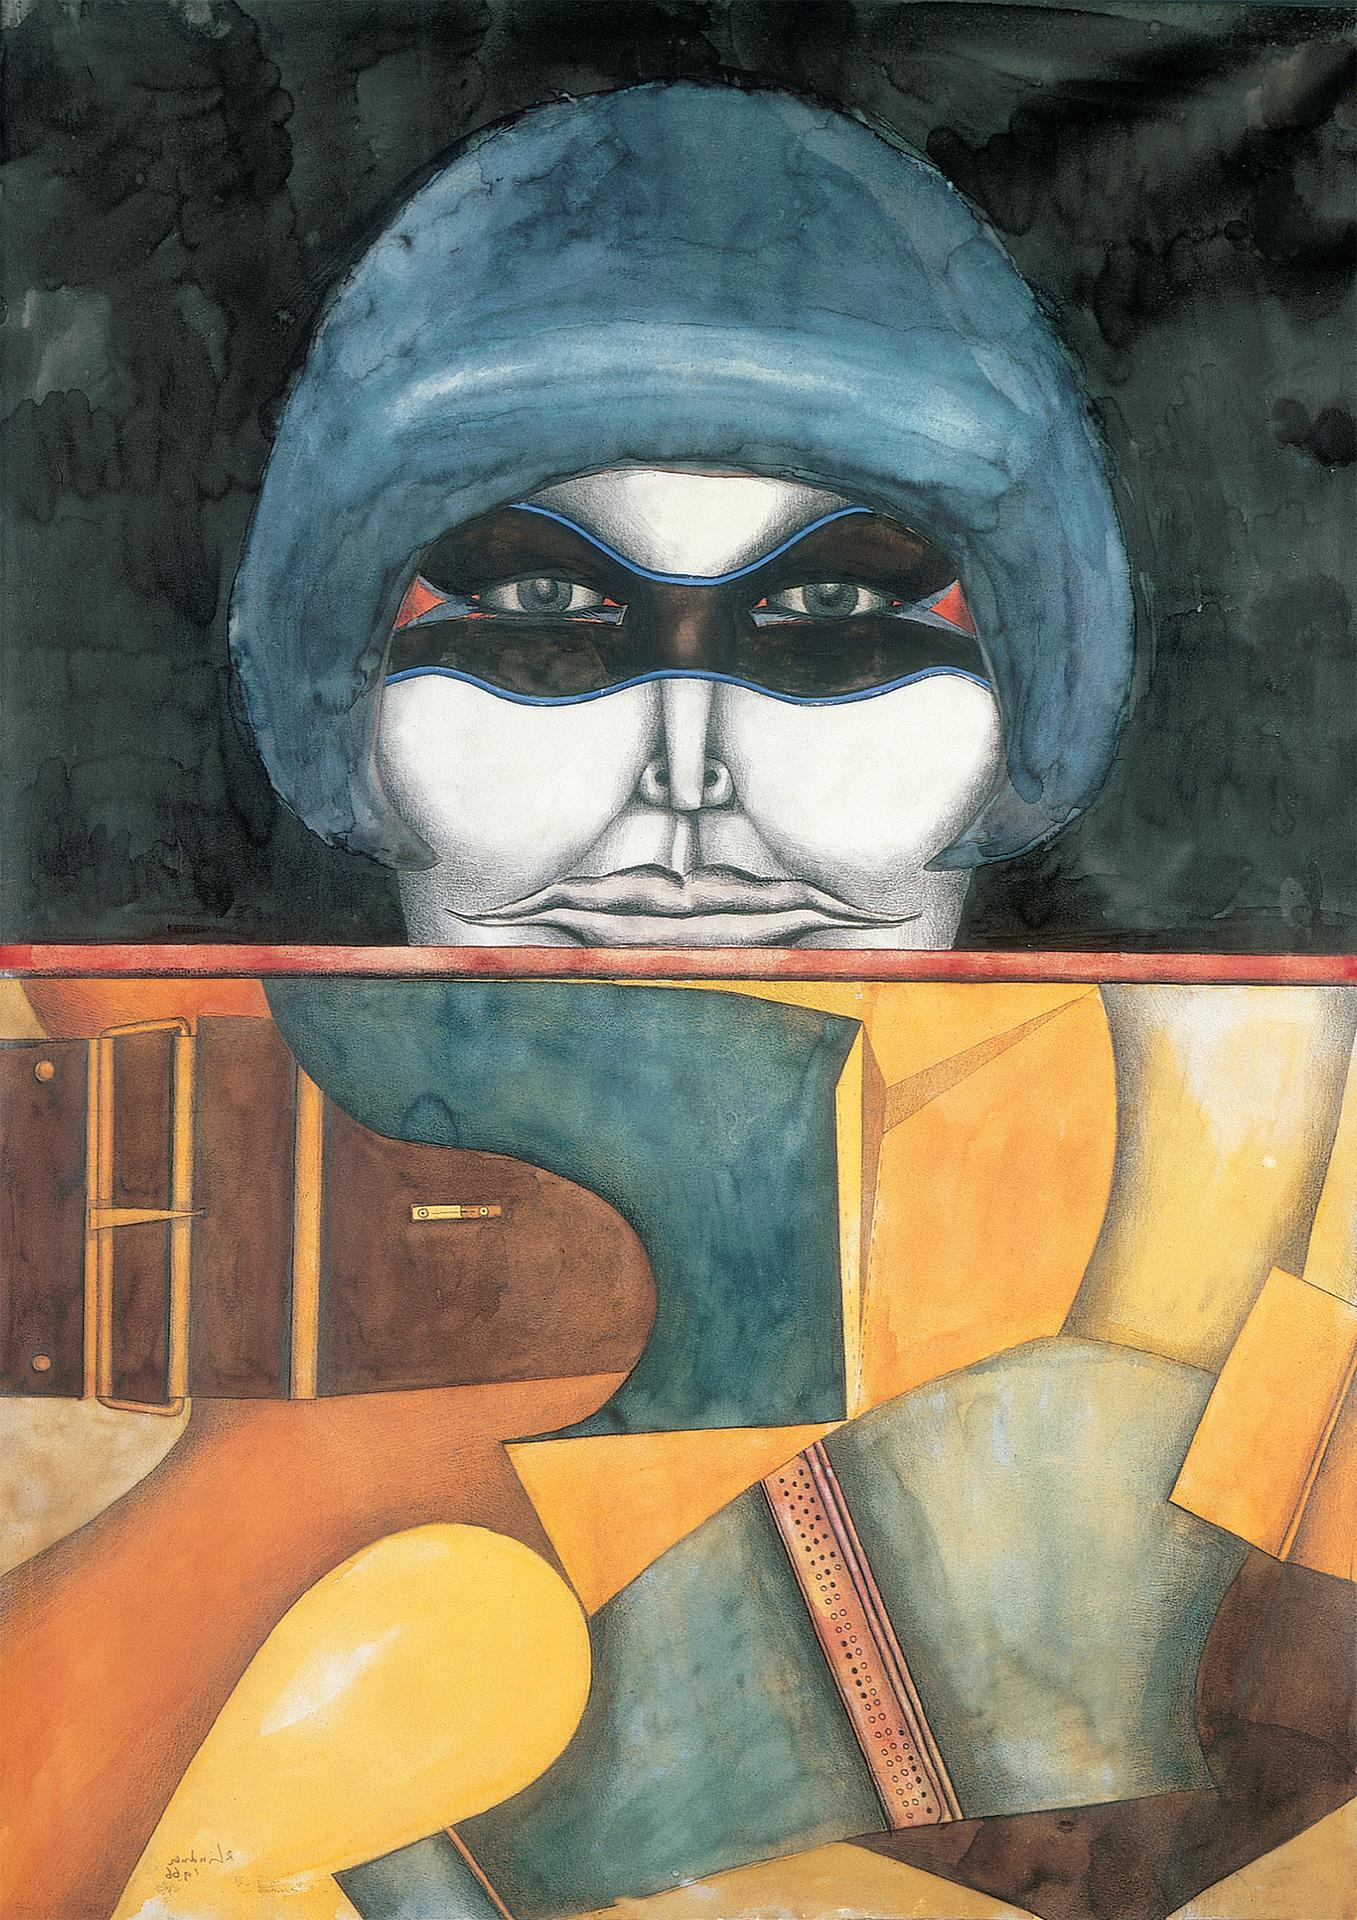 Untitled (Masked Woman), 1966